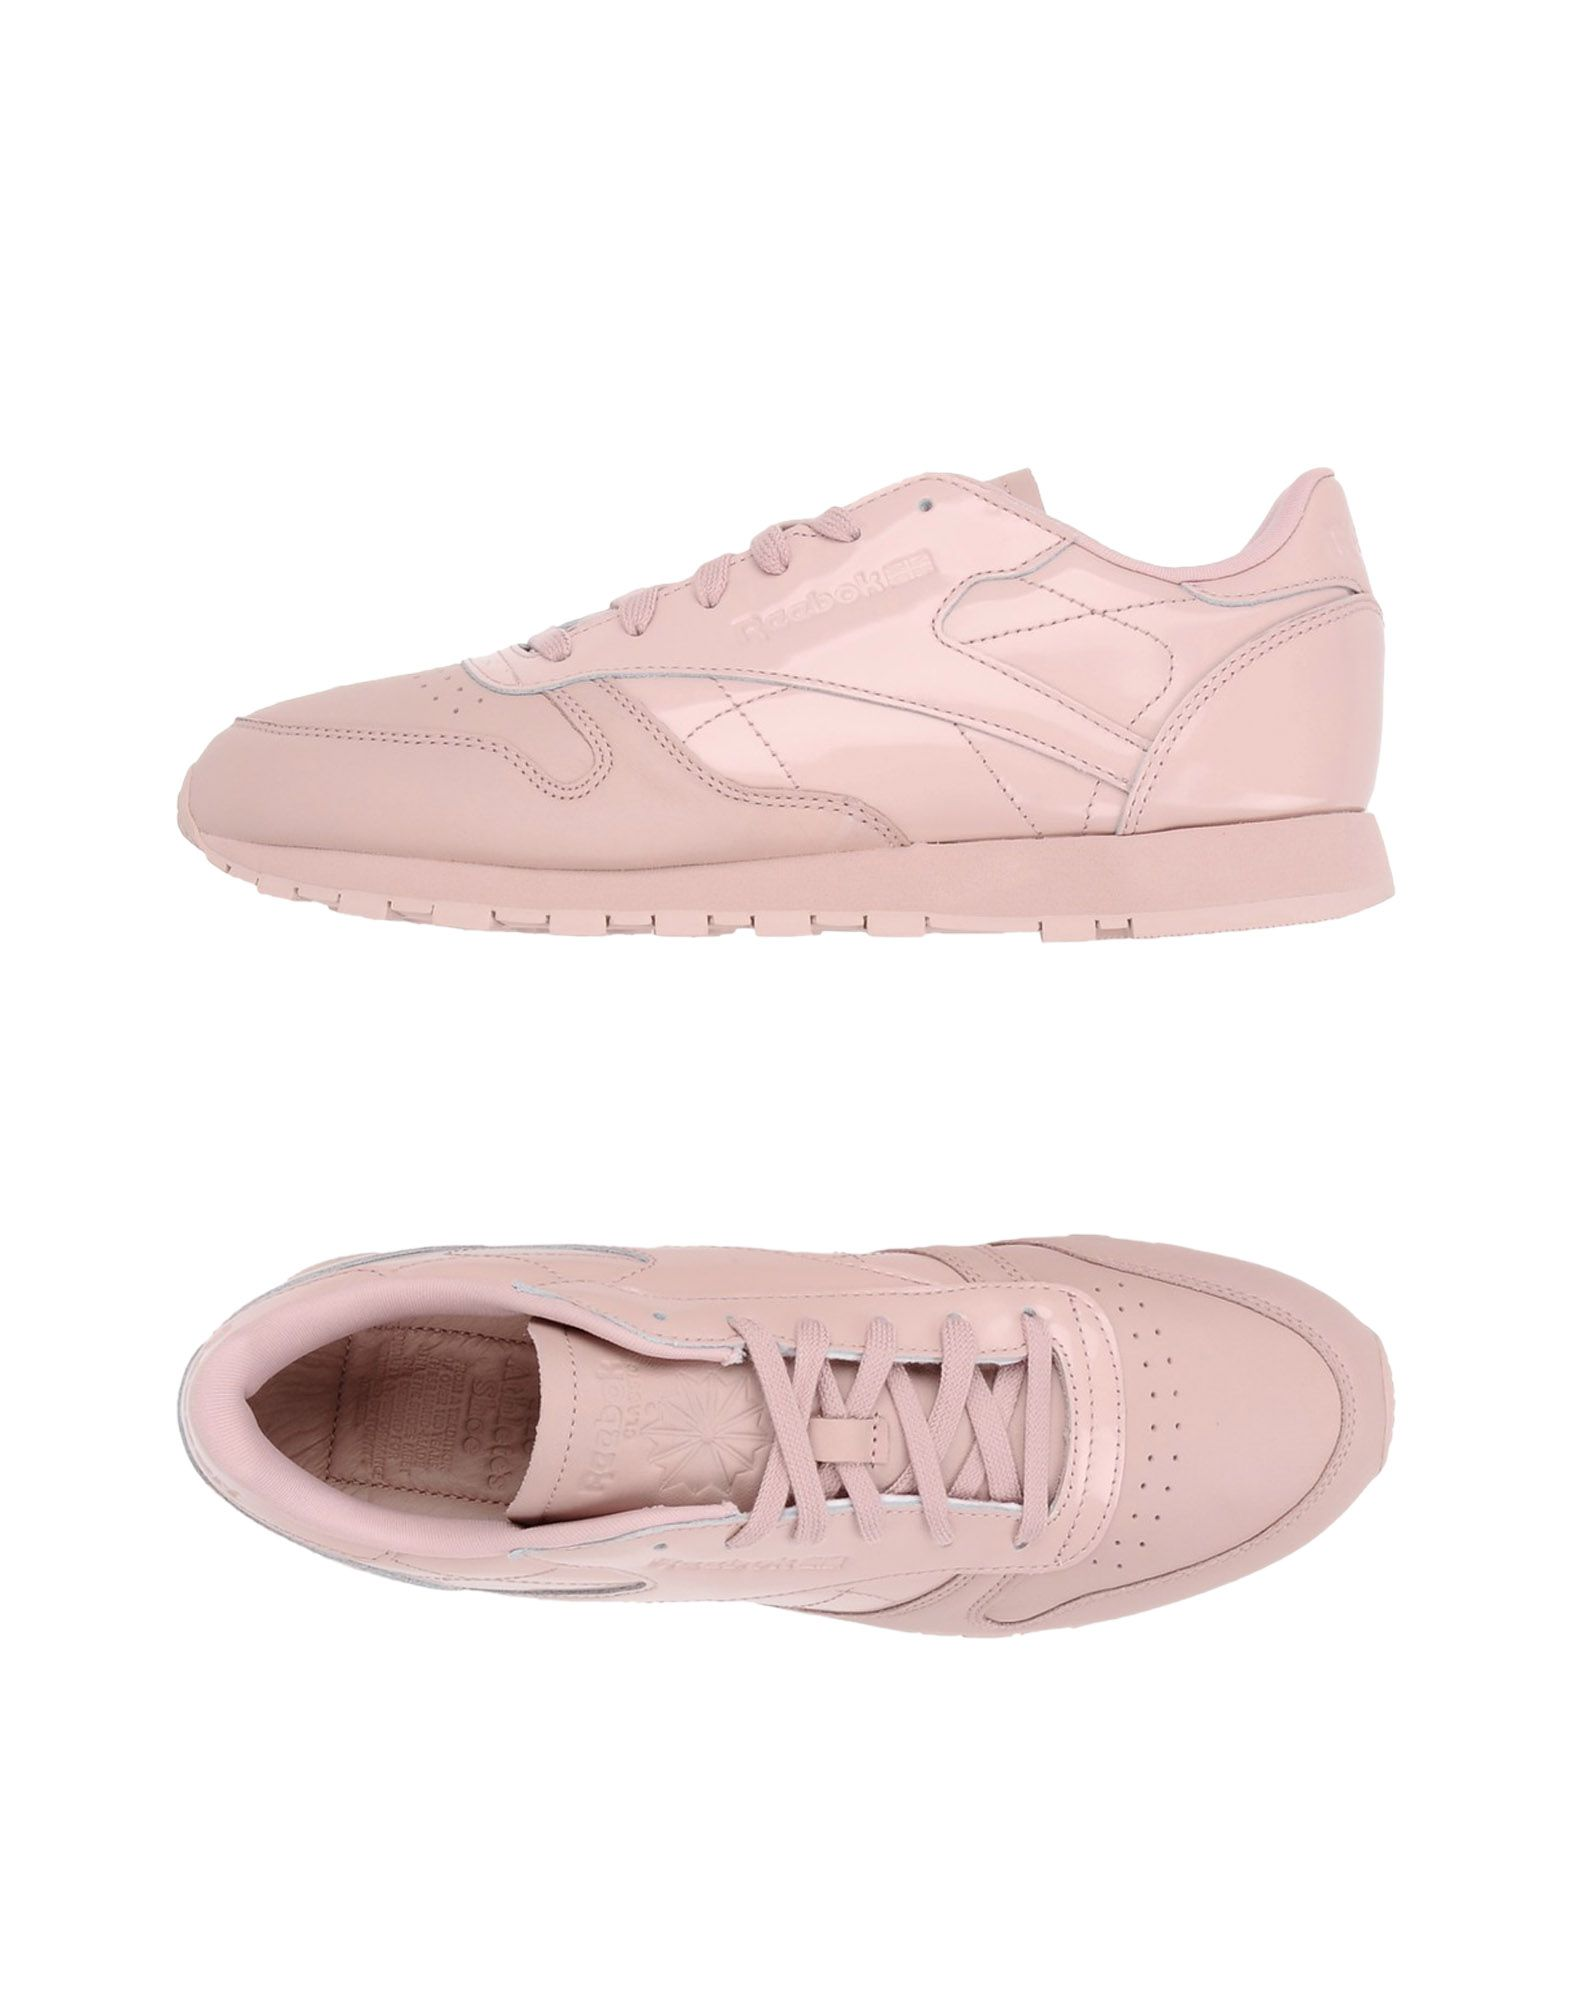 REEBOK Damen Low Sneakers & Tennisschuhe Farbe Rosa Größe 9 - broschei